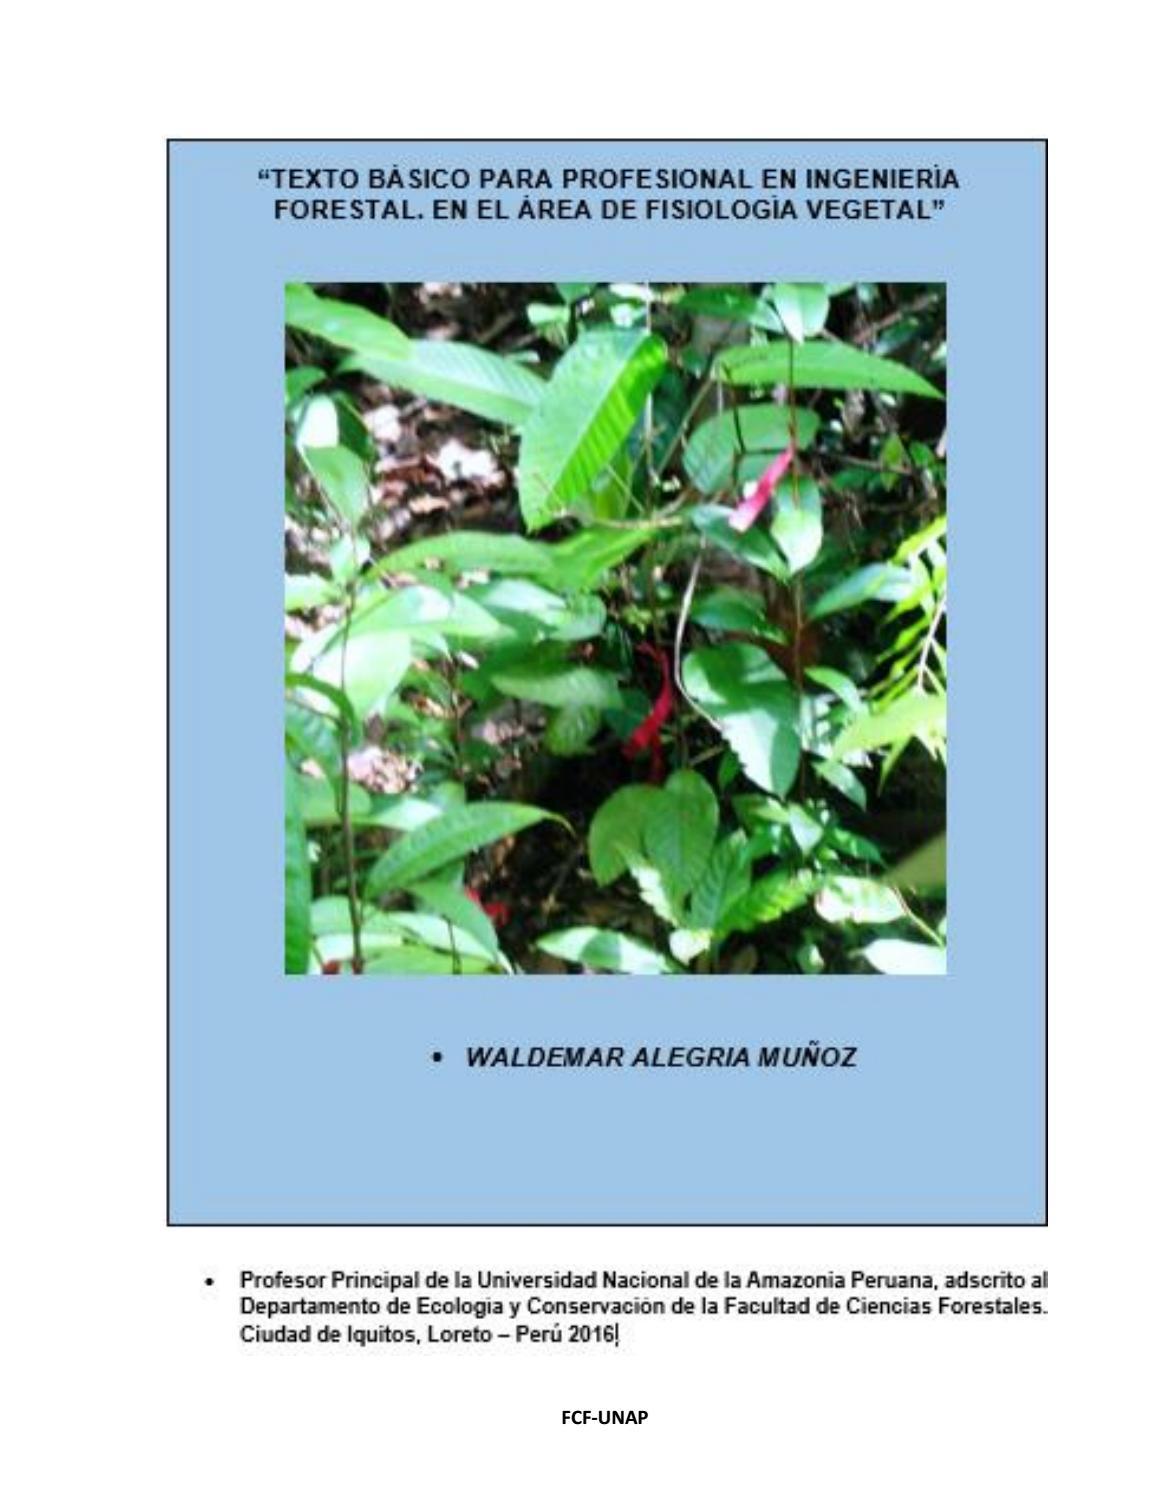 Fisiologia vegetal ingenieria forestal by meinardo - issuu